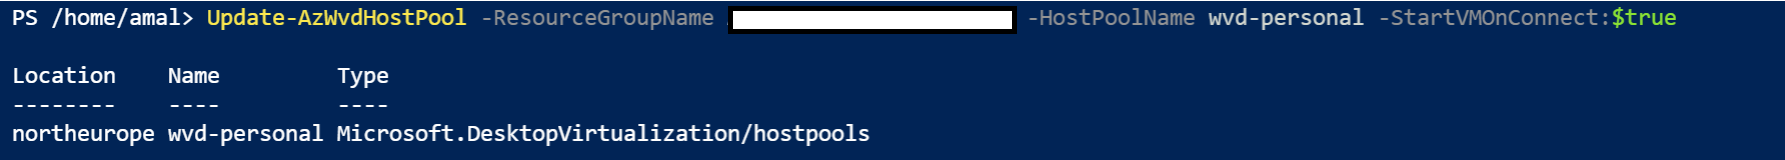 Machine generated alternative text: PS /home/amal> Update-AzWvdHostP001  -ResourceGroupName  -HostP001Name wvd-personal  - StartVMOnConnect : $true  Location  Name  Type  northeurope wvd-personal Microsoft. DesktopVirtua1ization/hostp001s